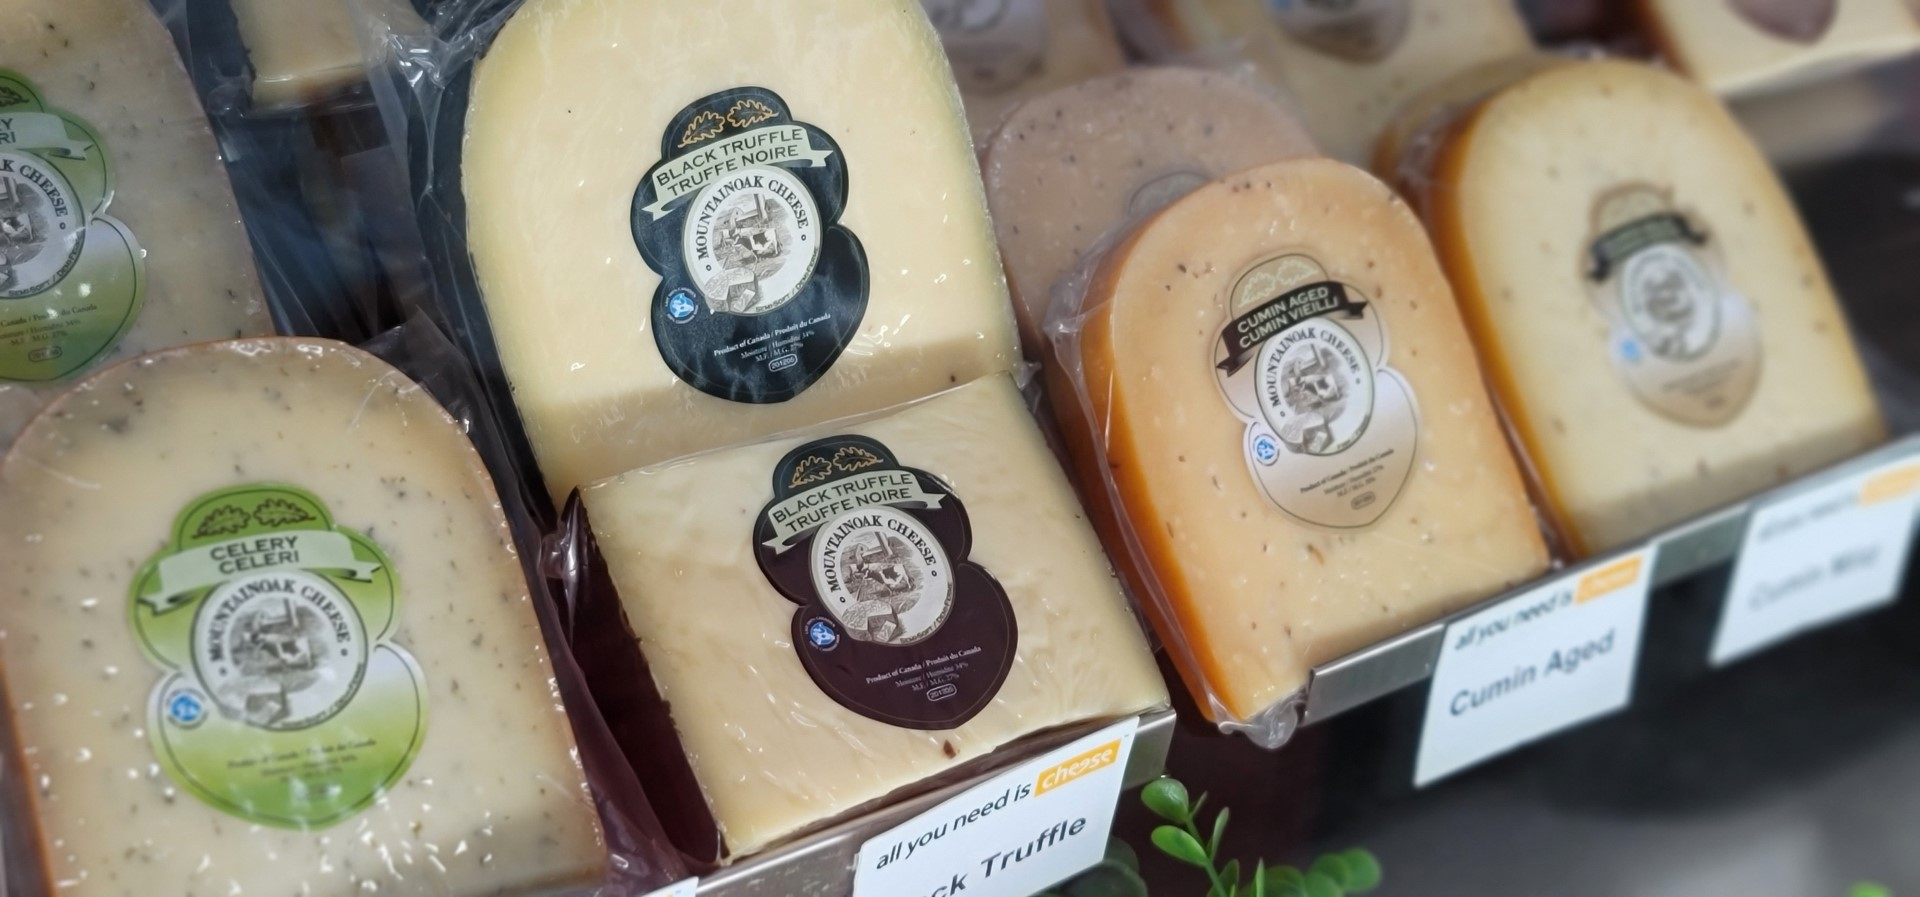 Truffle cheese on display